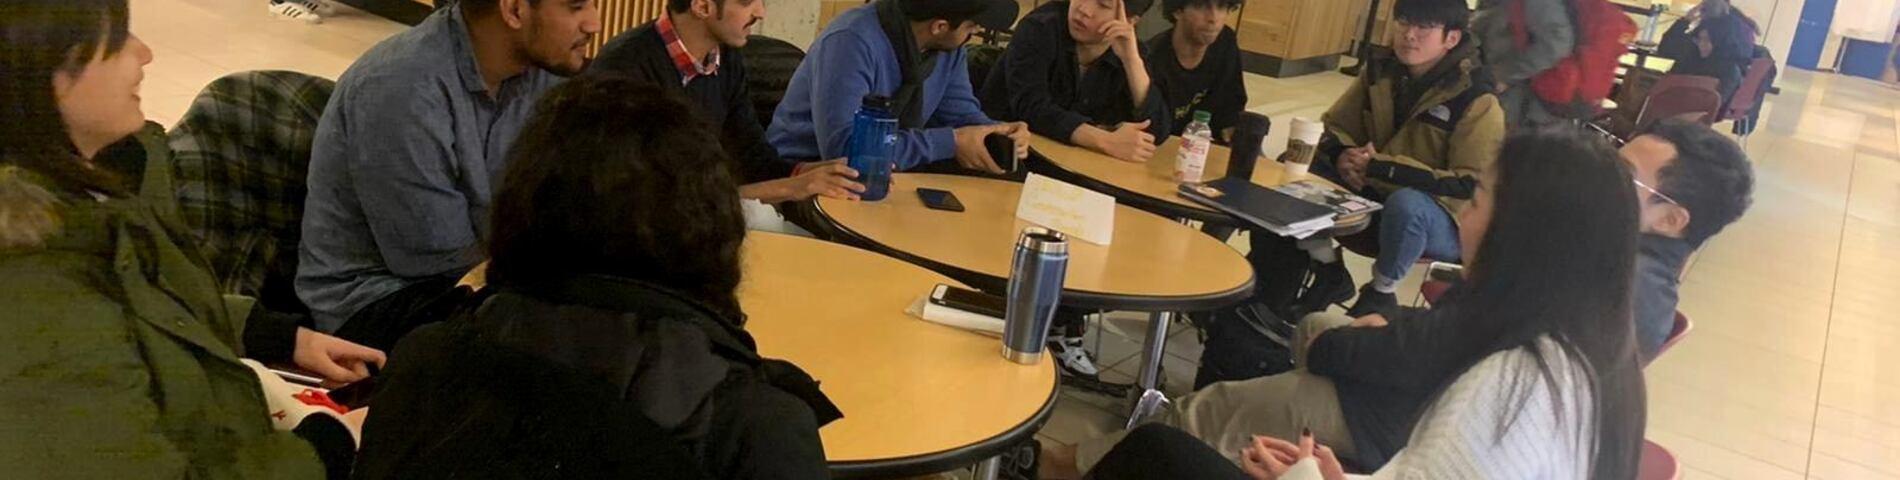 University of Washington International & English Language Programs foto 1